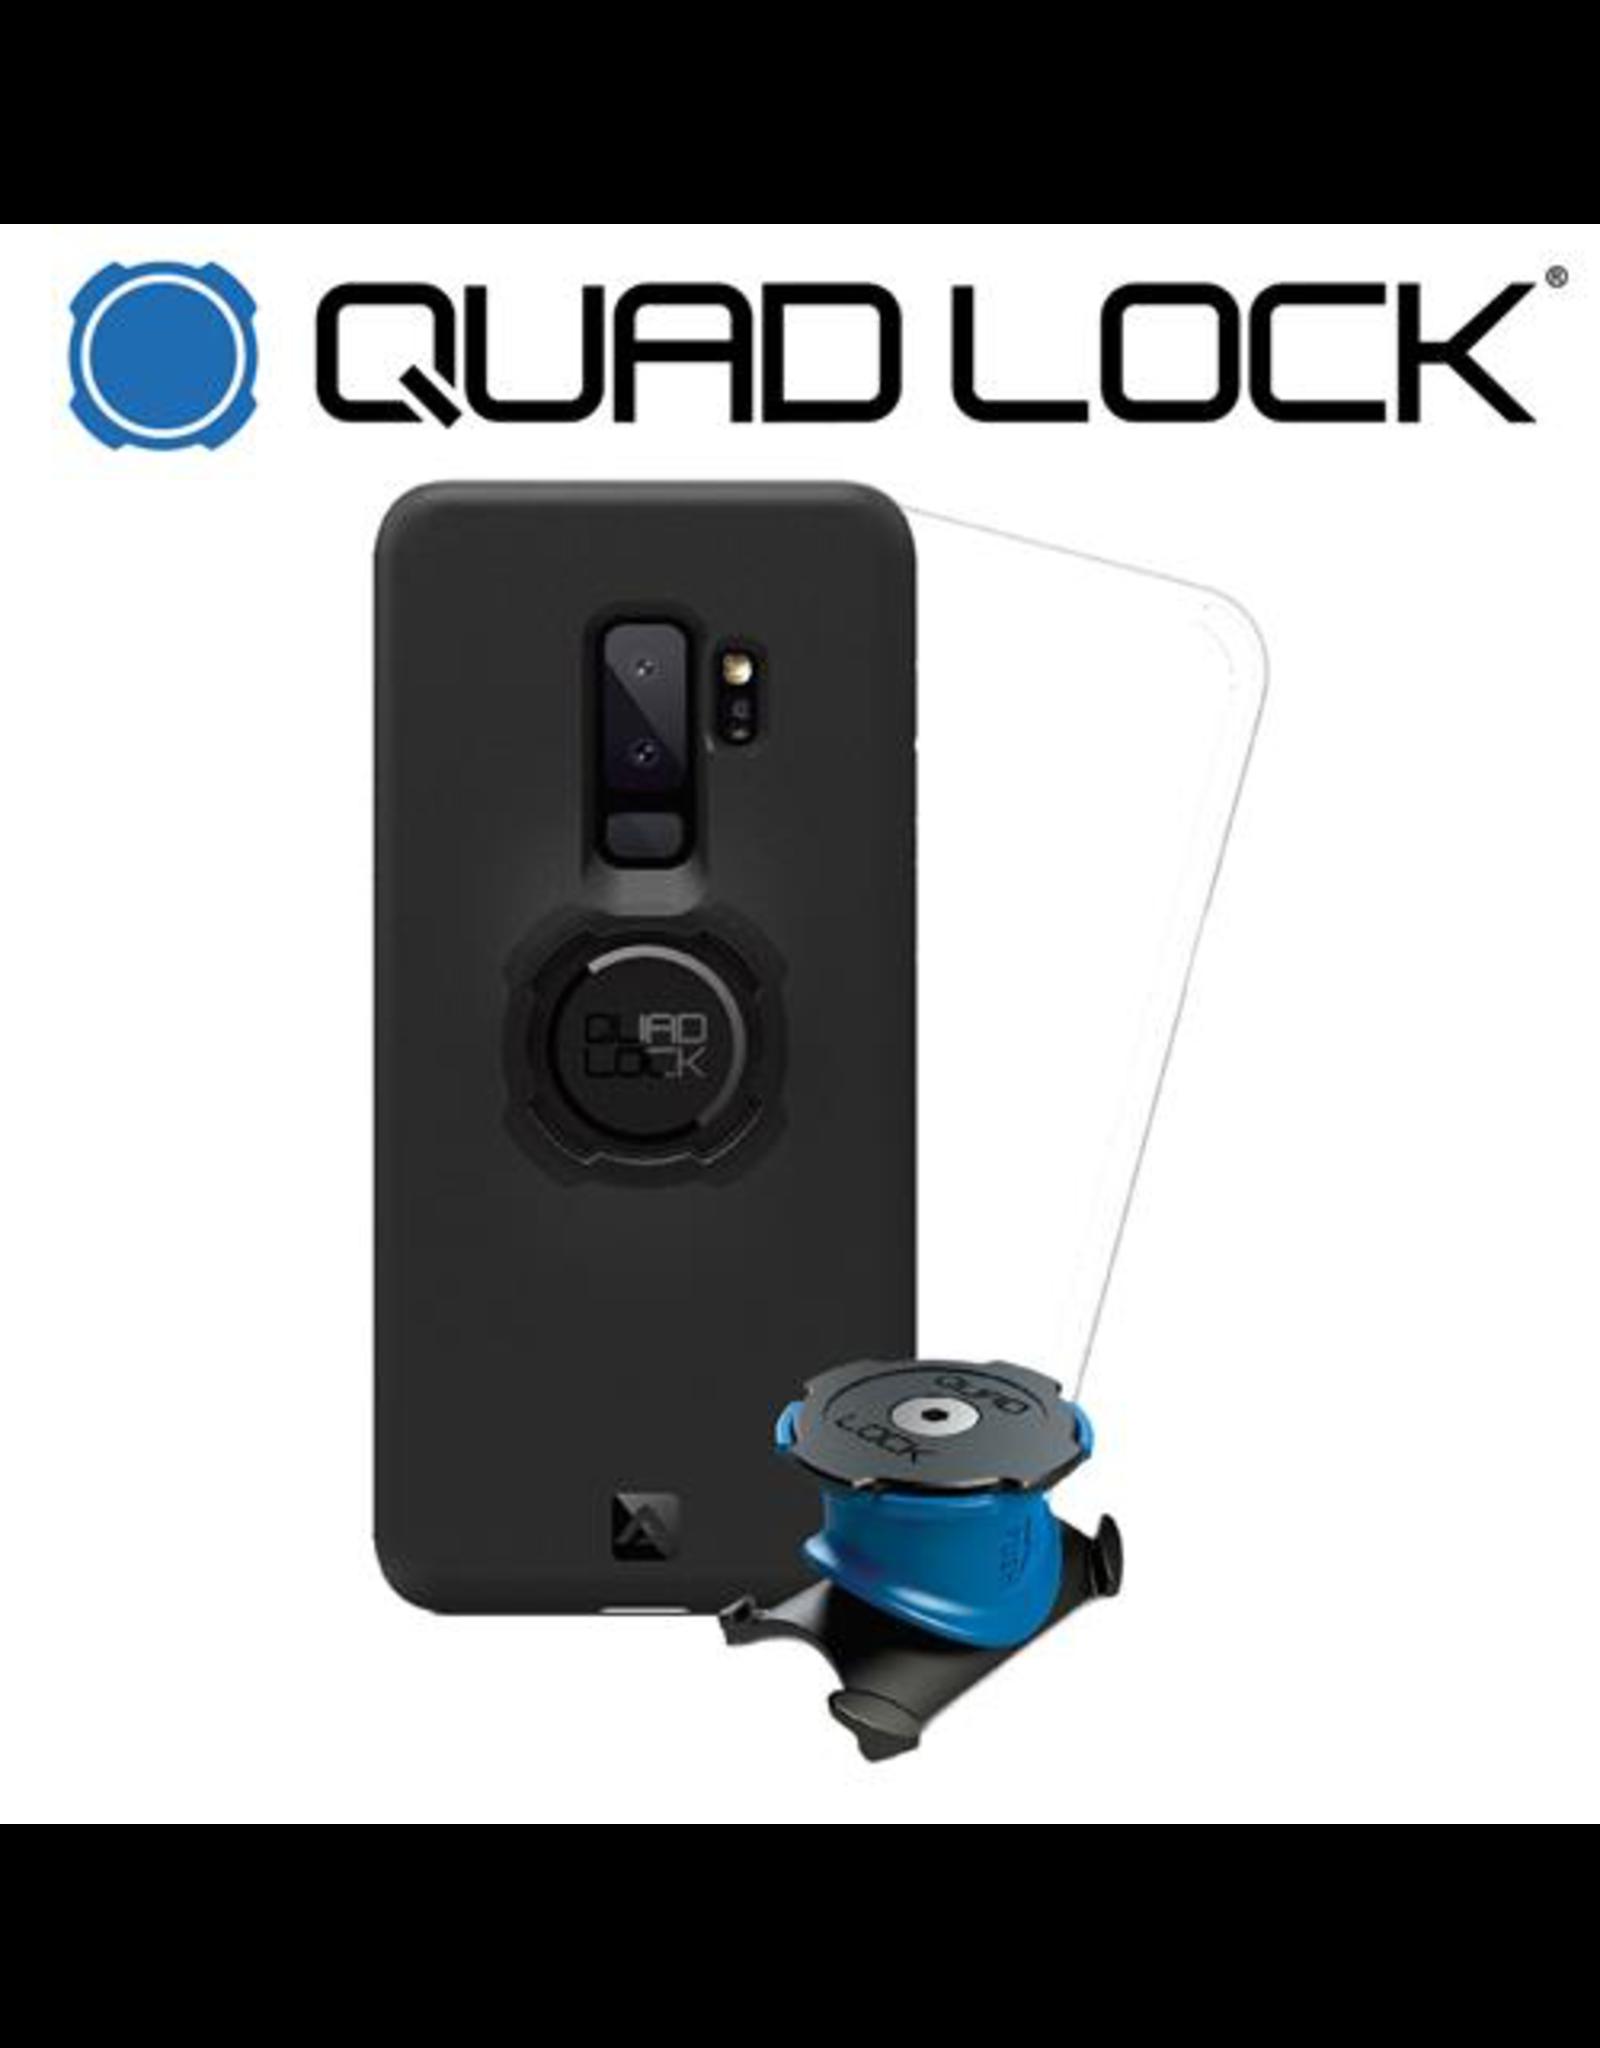 QUAD LOCK PHONE HOLDER QUAD LOCK BIKE KIT GALAXY S9 PLUS